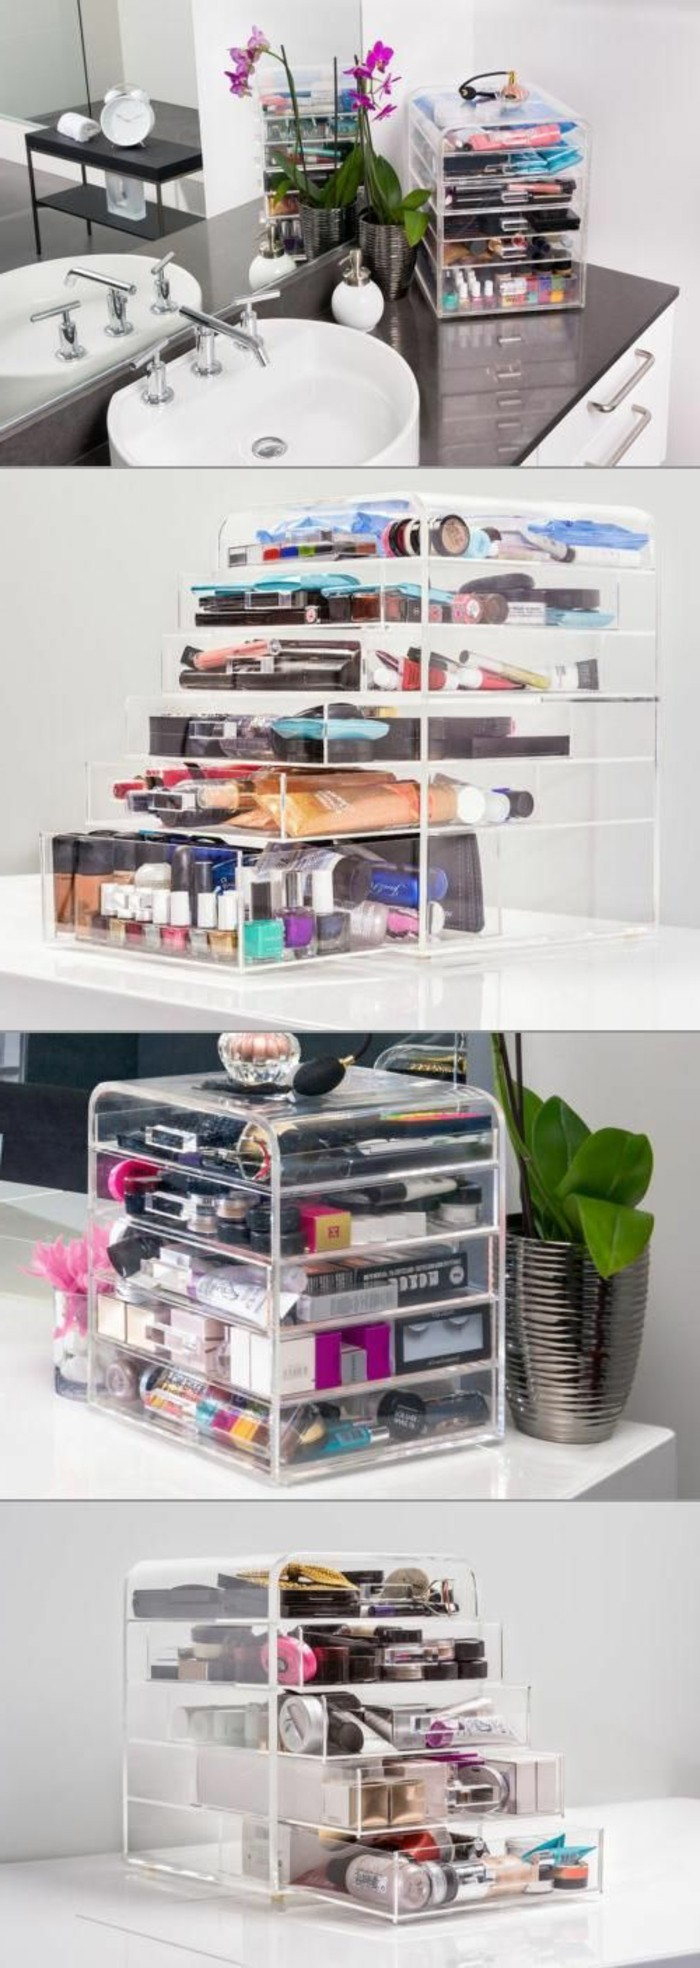 52 id es de rangement make up en photos et vid os. Black Bedroom Furniture Sets. Home Design Ideas